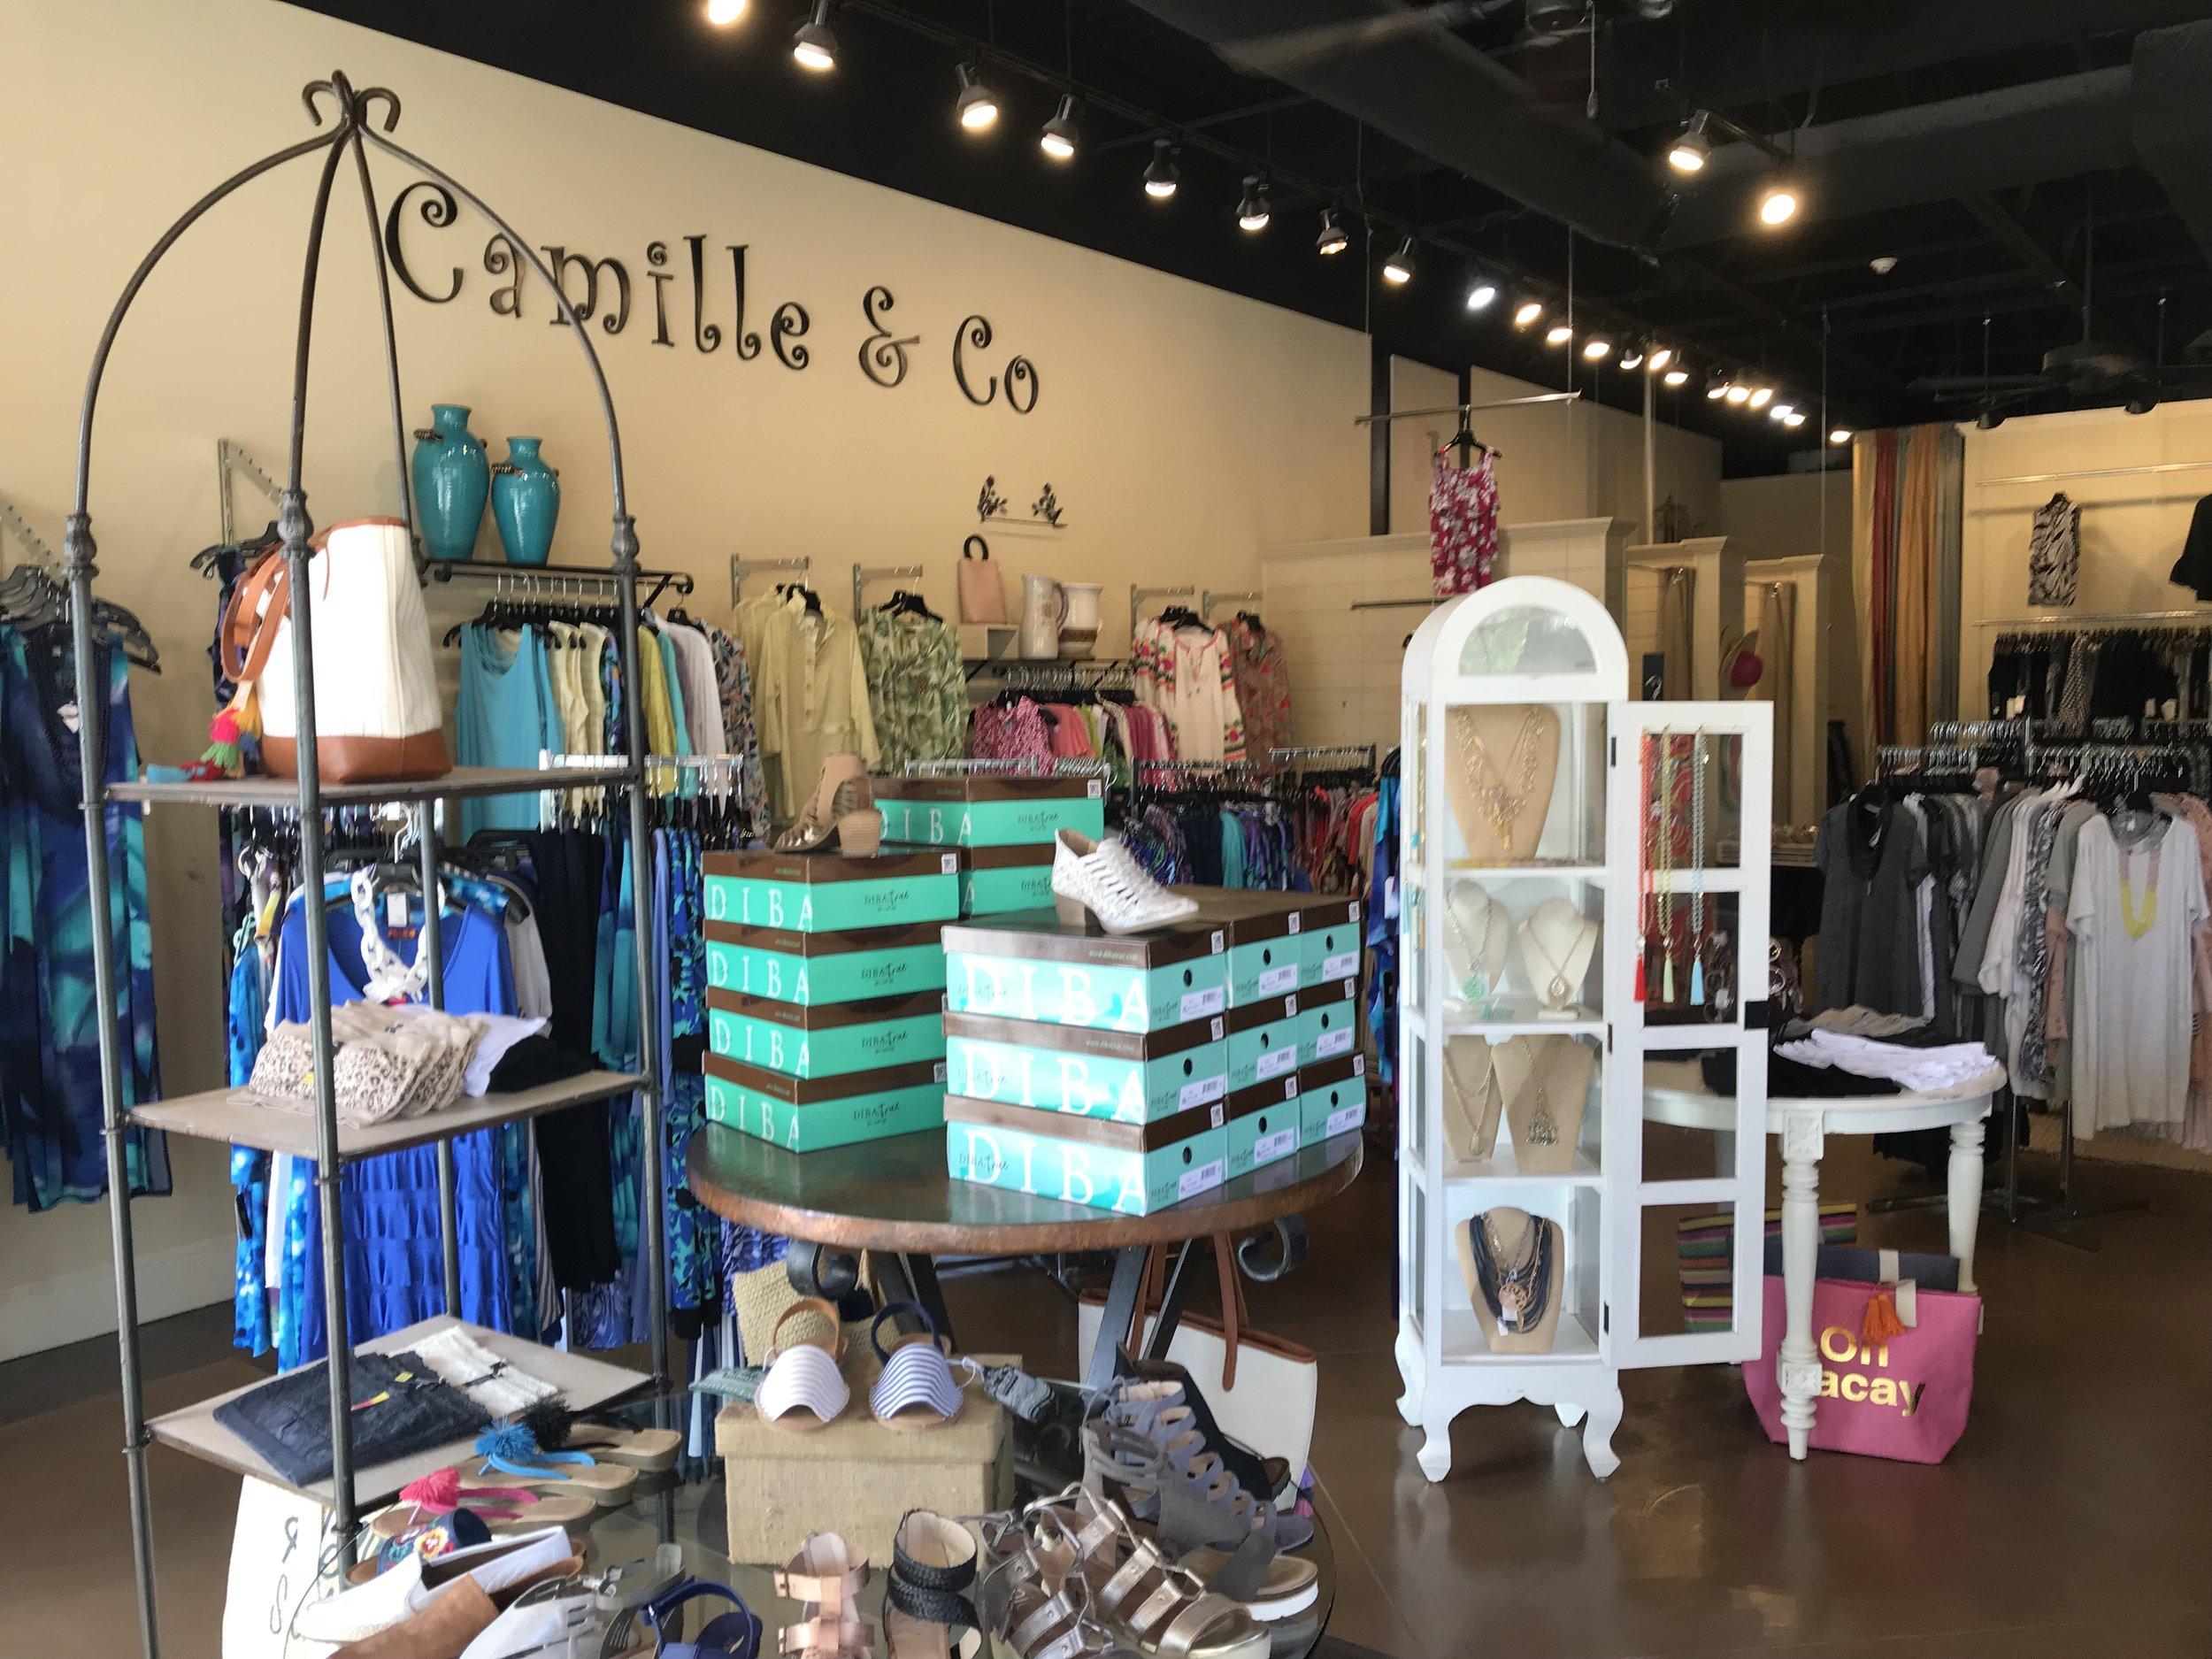 Camille & Co Lake Oconee   RealEstateLakeOconee.com